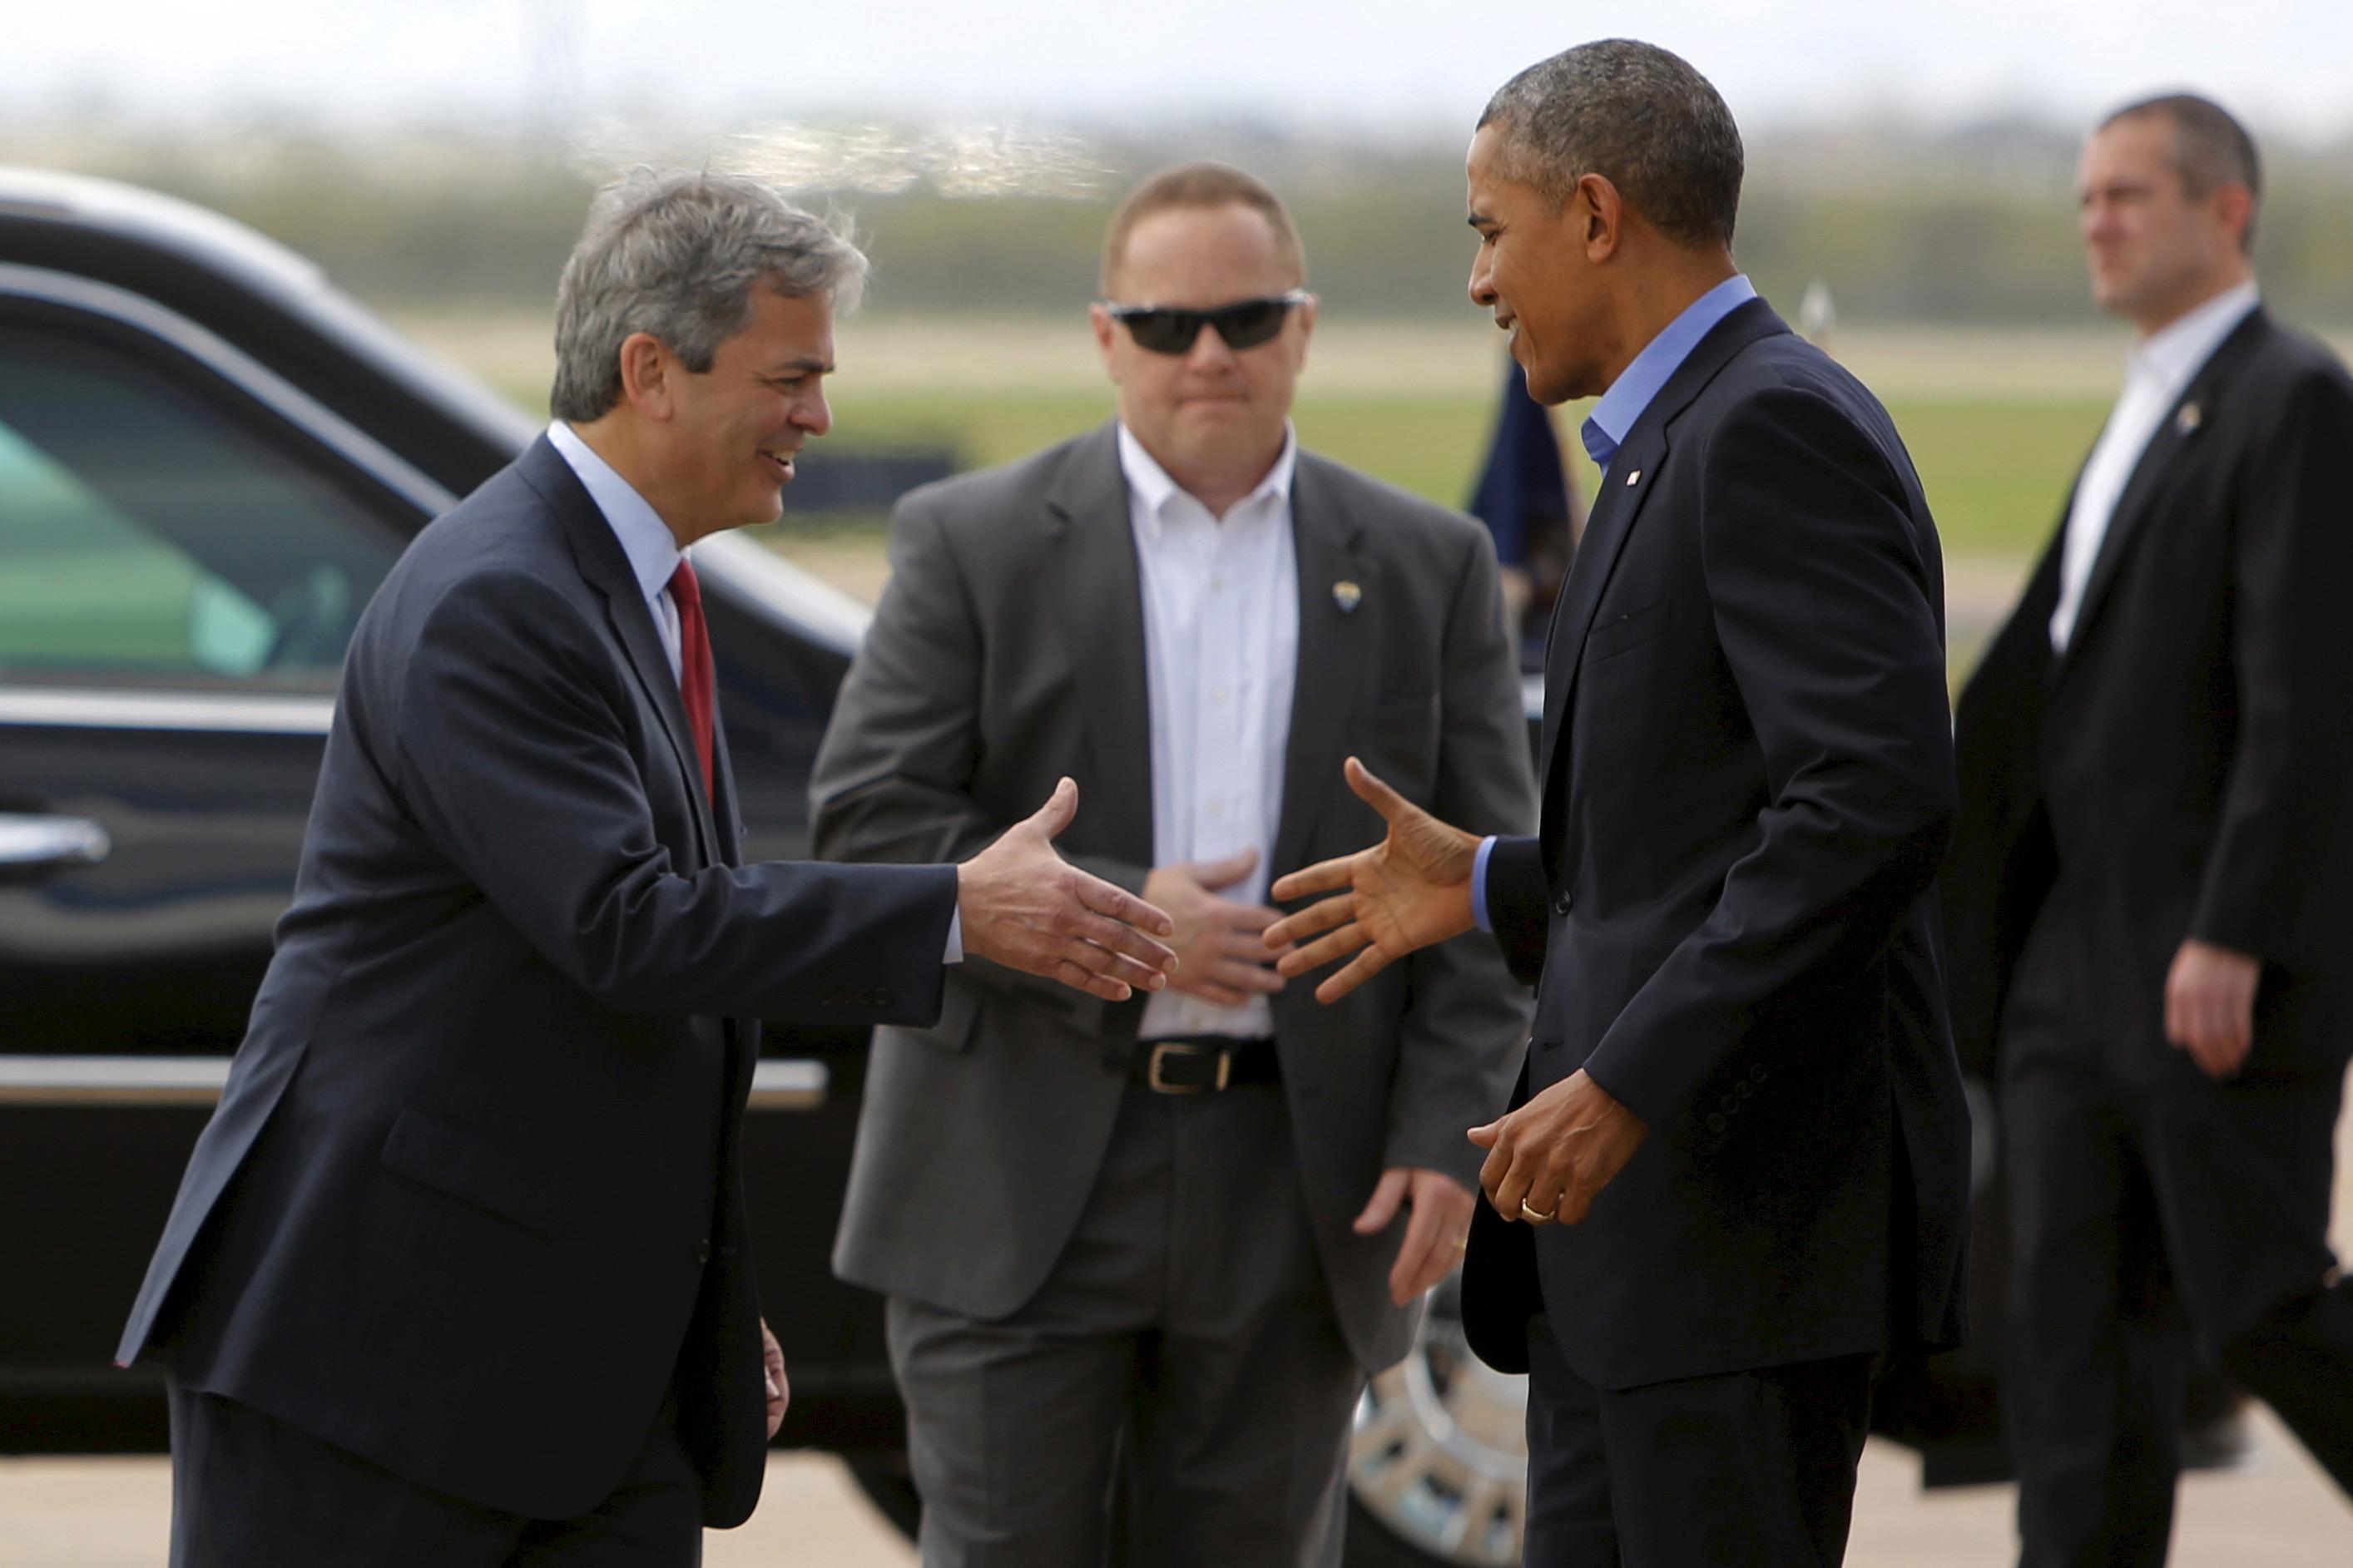 Austin Mayor Steve Adler (L) greets U.S. President Barack Obama as he arrives at Austin Bergstrom International Airport in Austin, Texas, U.S., March 11, 2016. REUTERS/Jonathan Ernst /File Photo